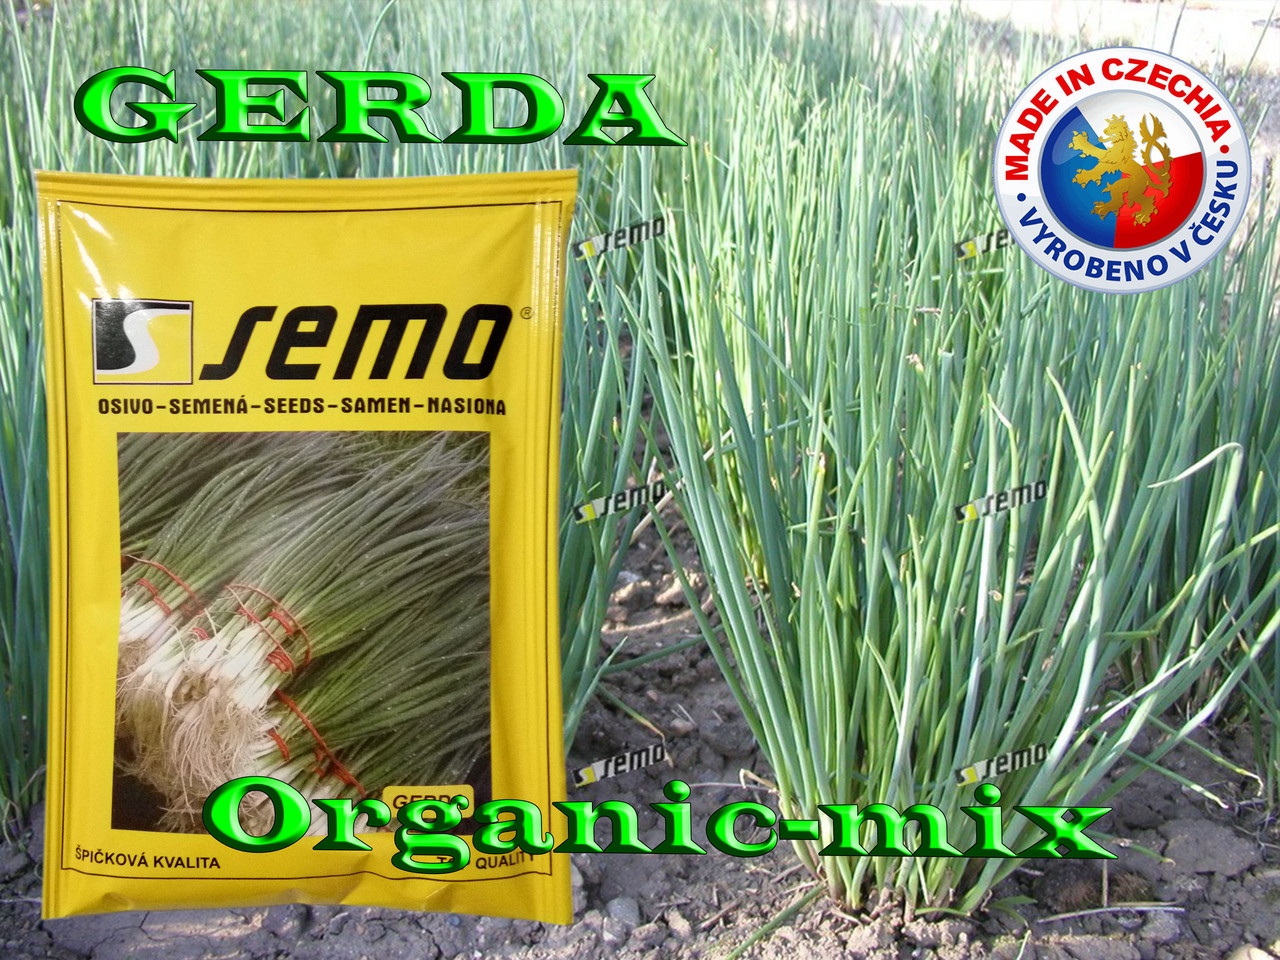 Лук на зелень ГЕРДА / GERDA, ТМ SEMO (Чехия), проф. пакет 50 грамм (ориентировочно 20 000 семян)